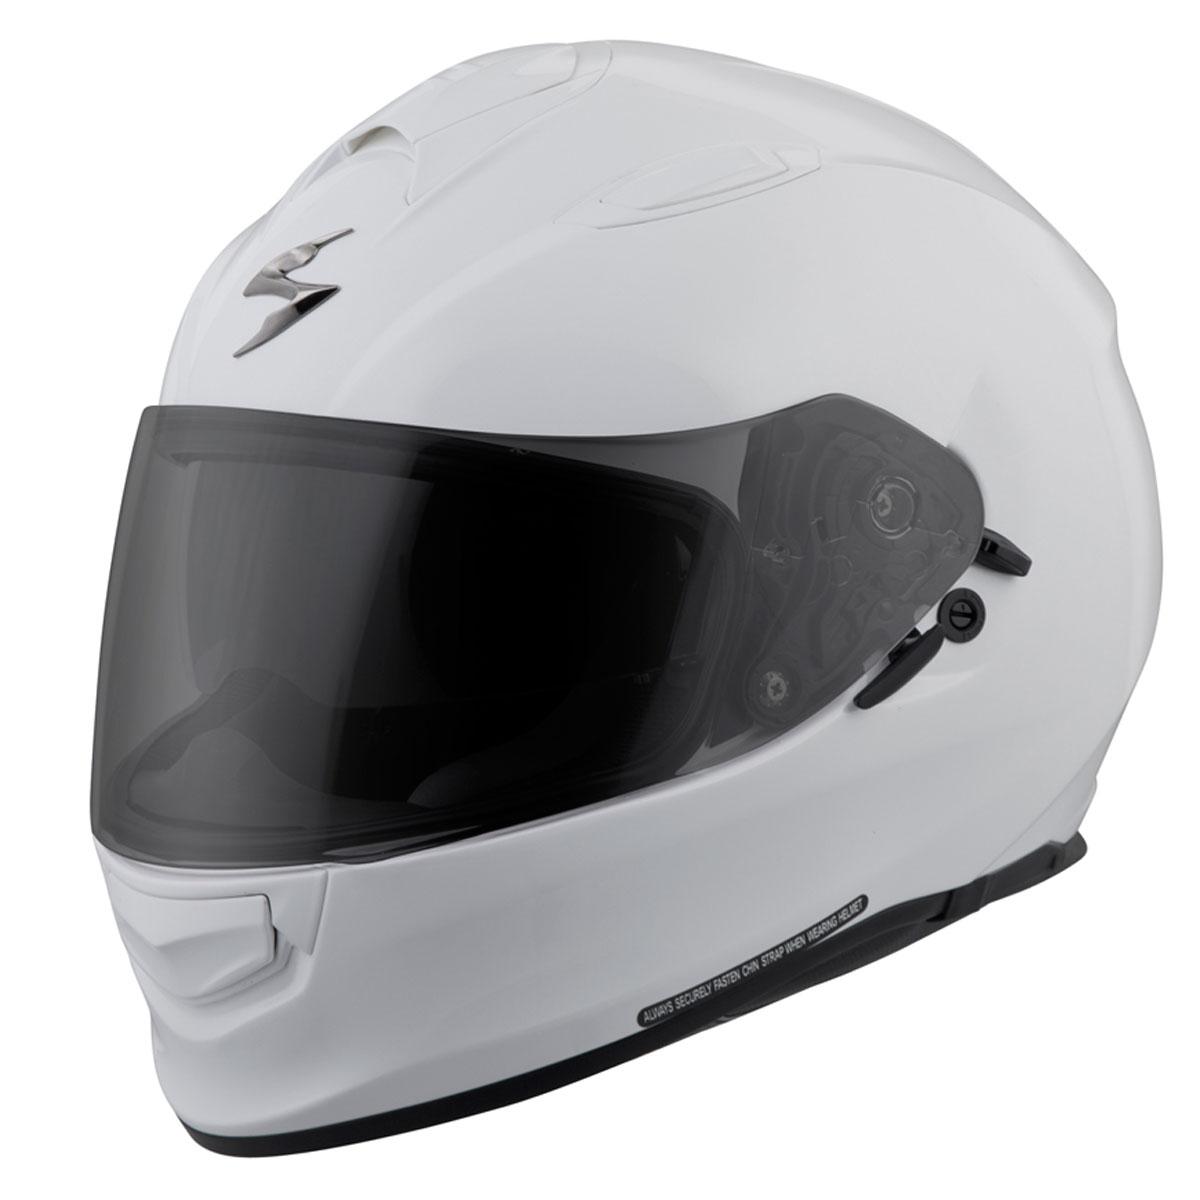 scorpion exo t510 motorcycle helmet ebay. Black Bedroom Furniture Sets. Home Design Ideas